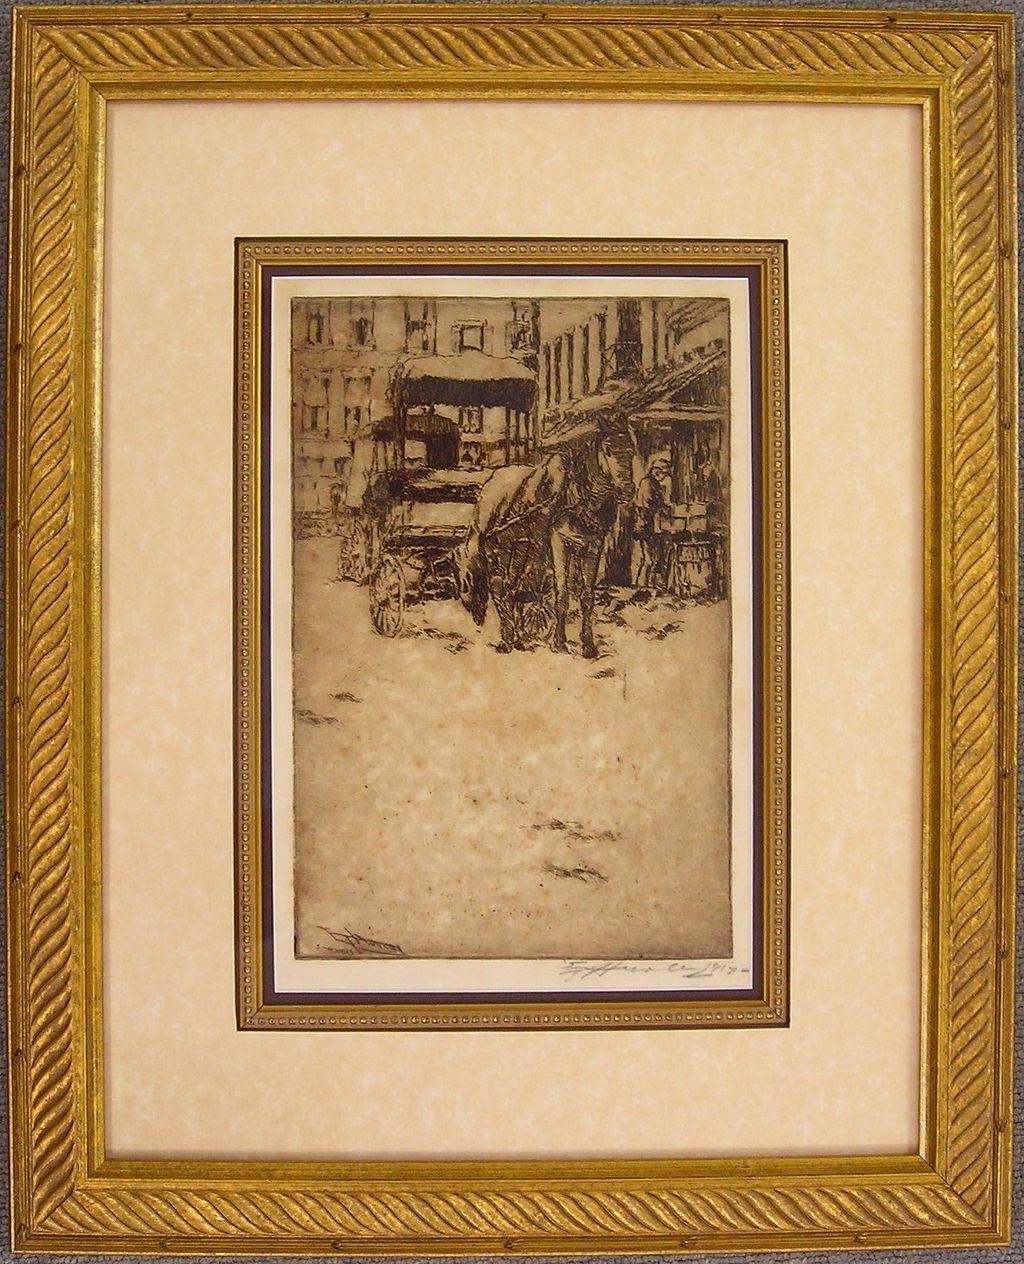 Cincinnati Market Original Etching by Hurley, Signed